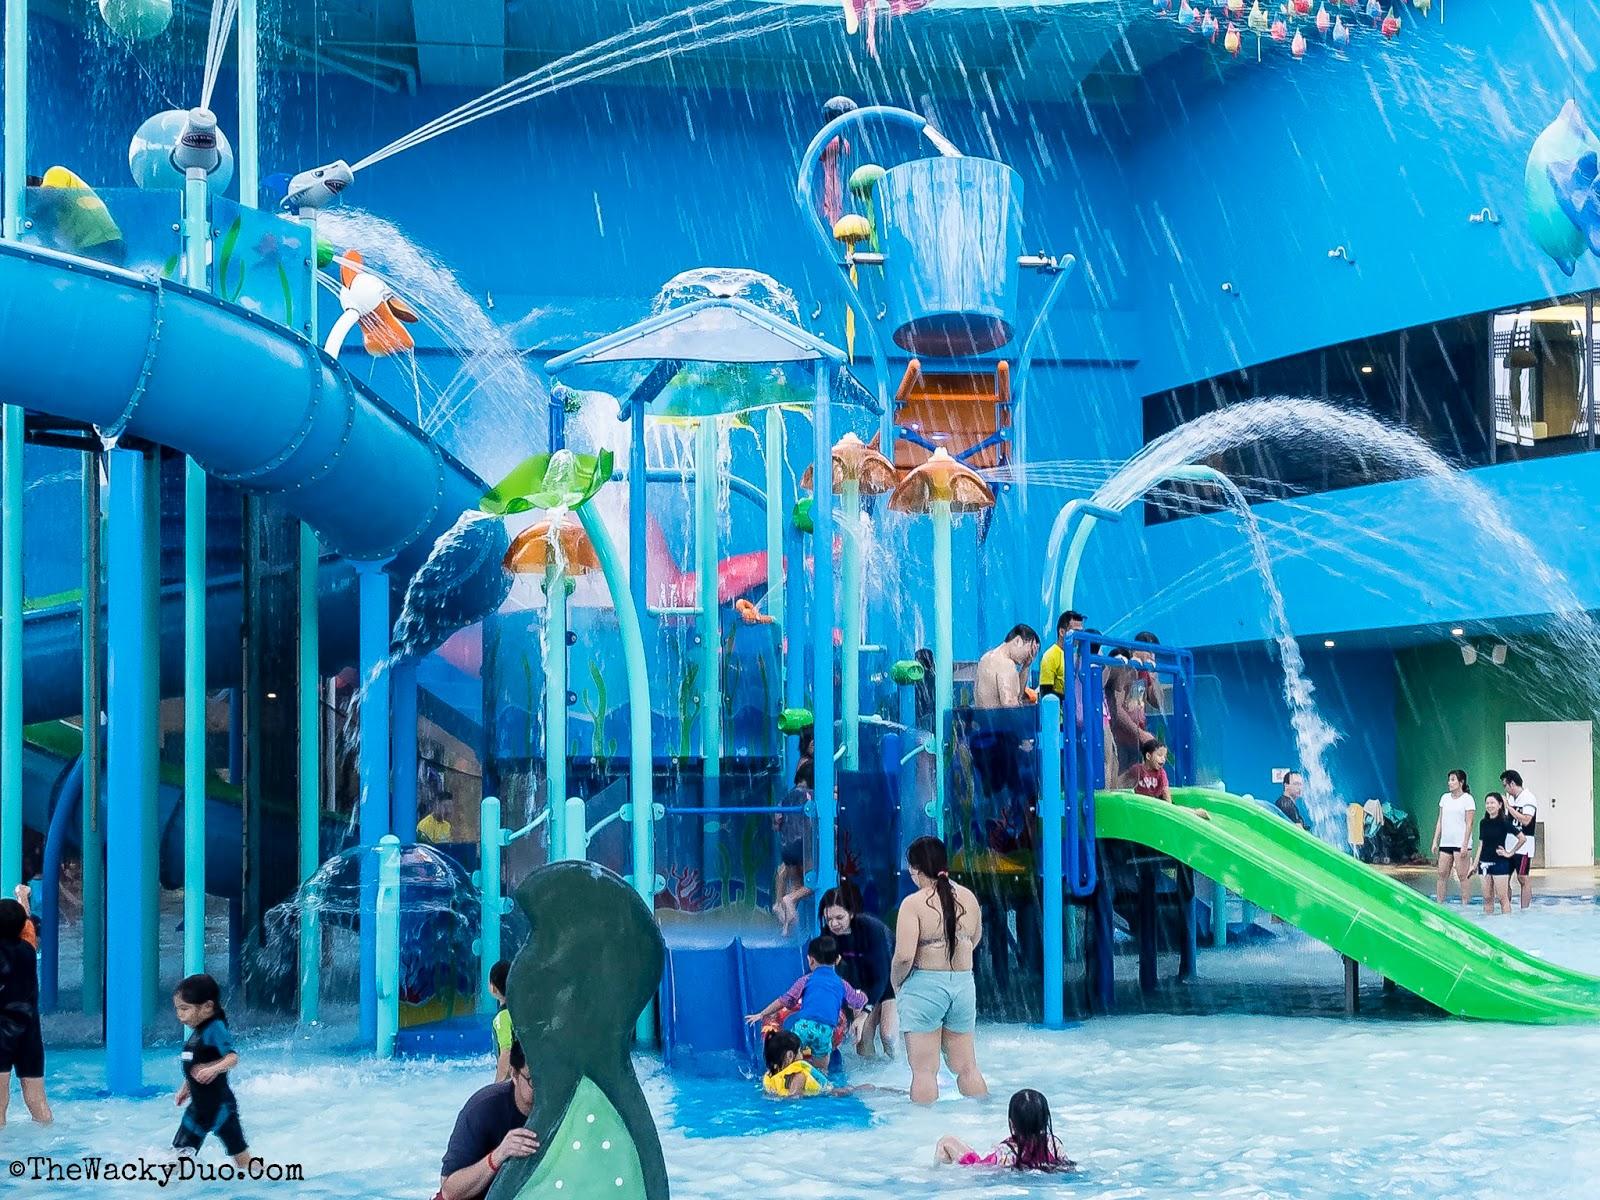 Splash Kidz Amaze Safra Punggol Review The Wacky Duo Singapore Family Lifestyle And